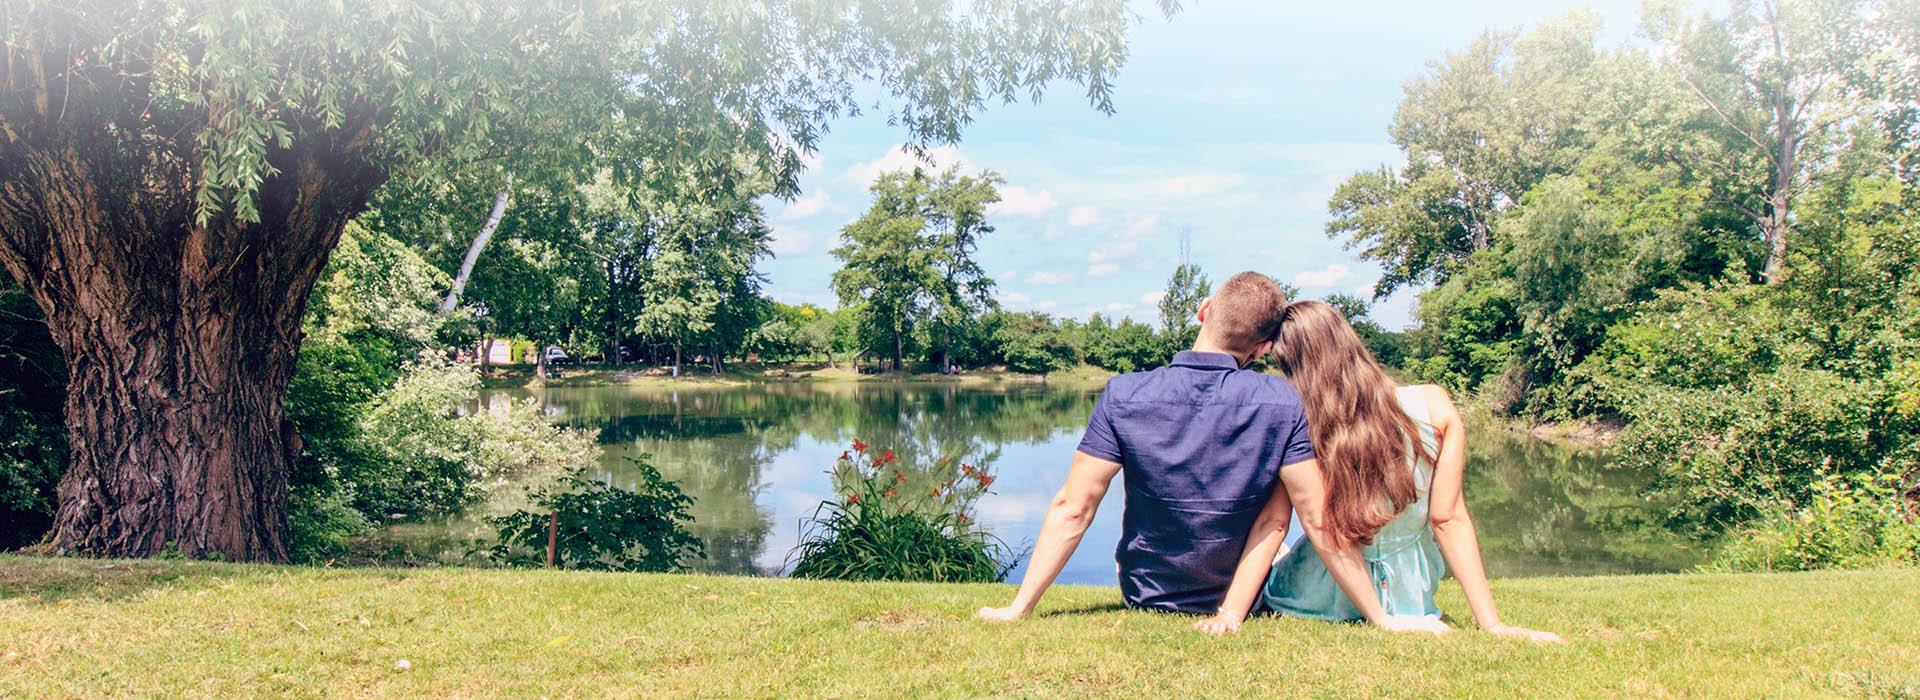 Partnersuche, Liebe, Dating